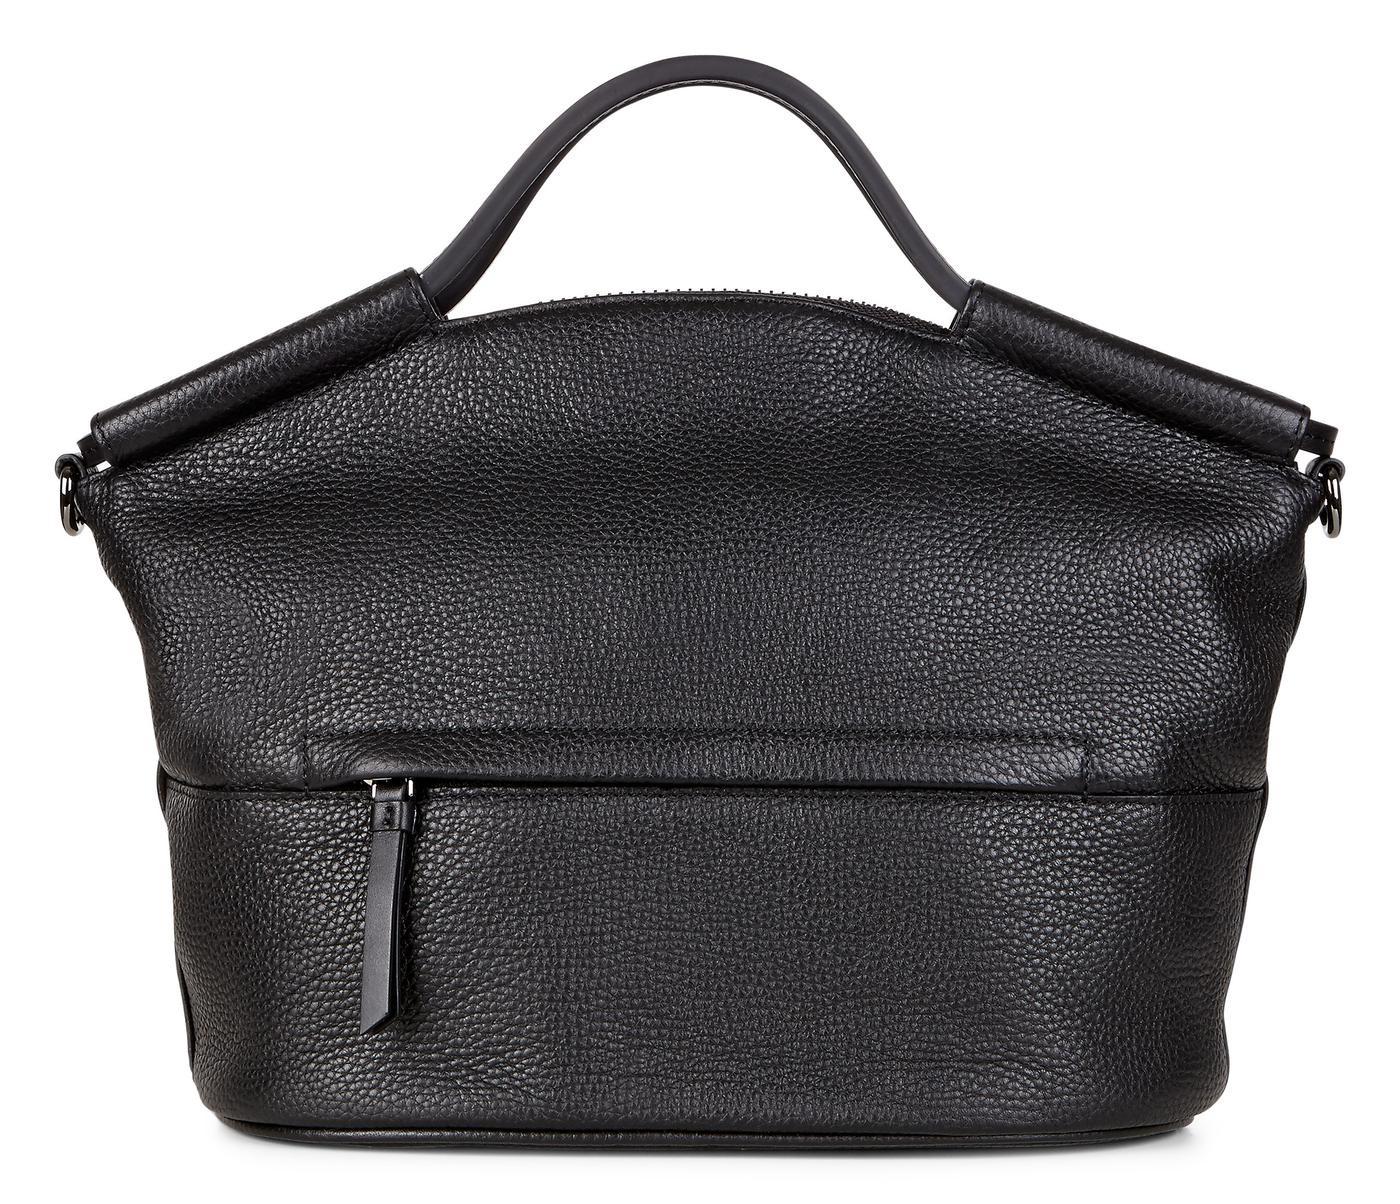 ECCO SP 2 Medium Doctor's Bag